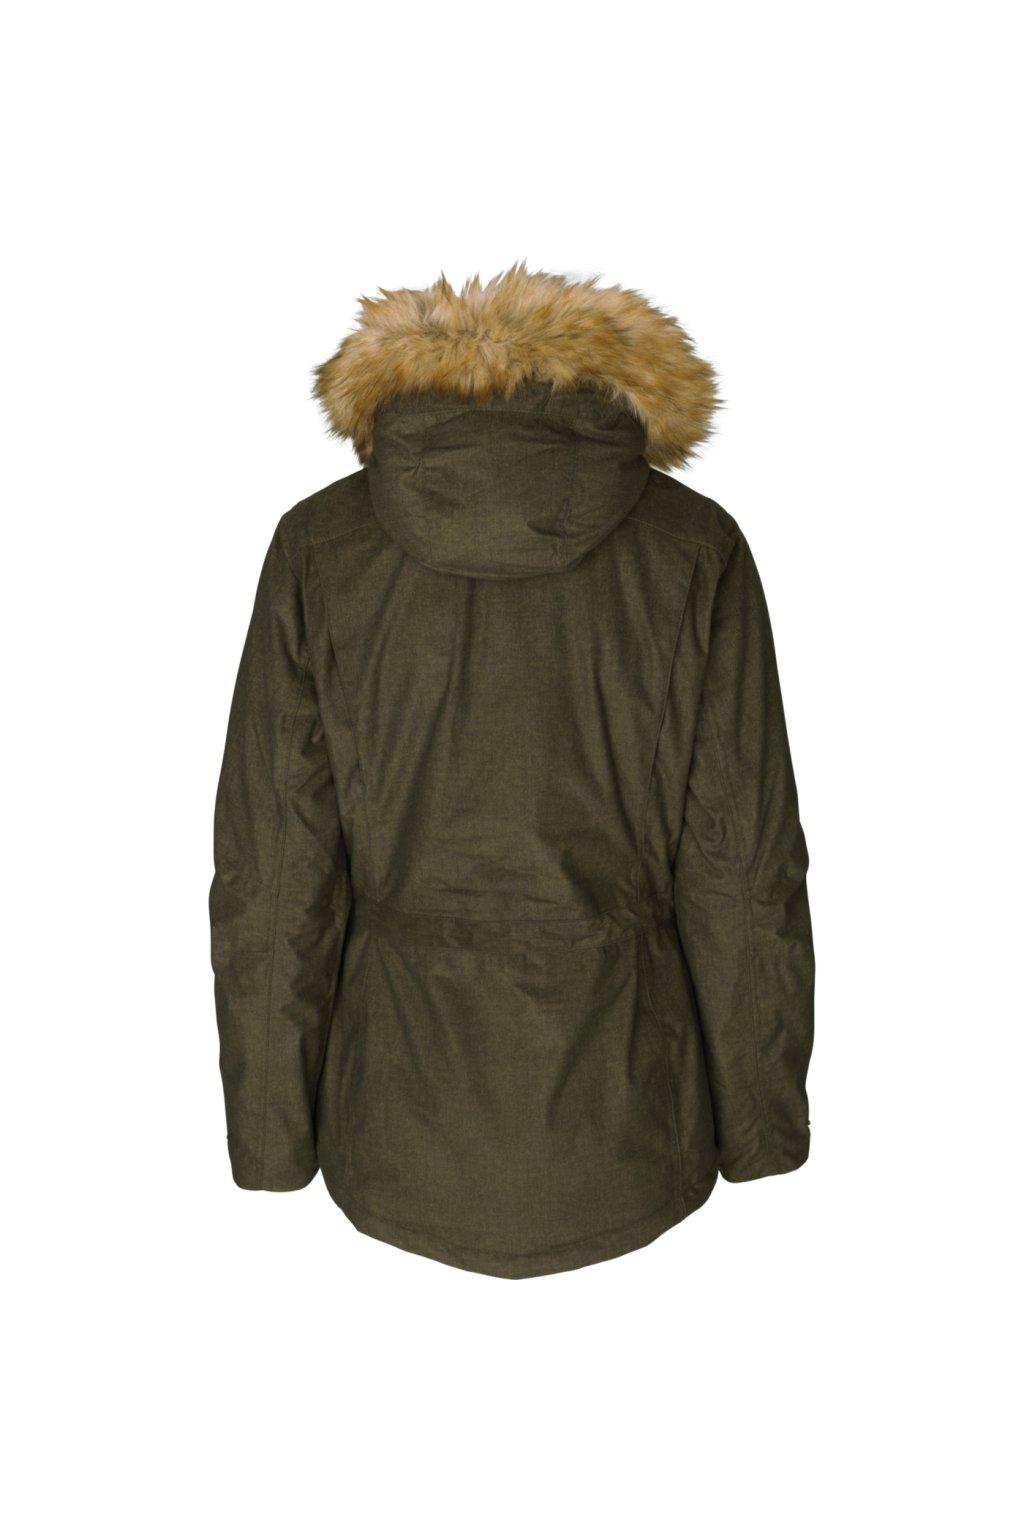 Seeland - North Lady bunda zimní